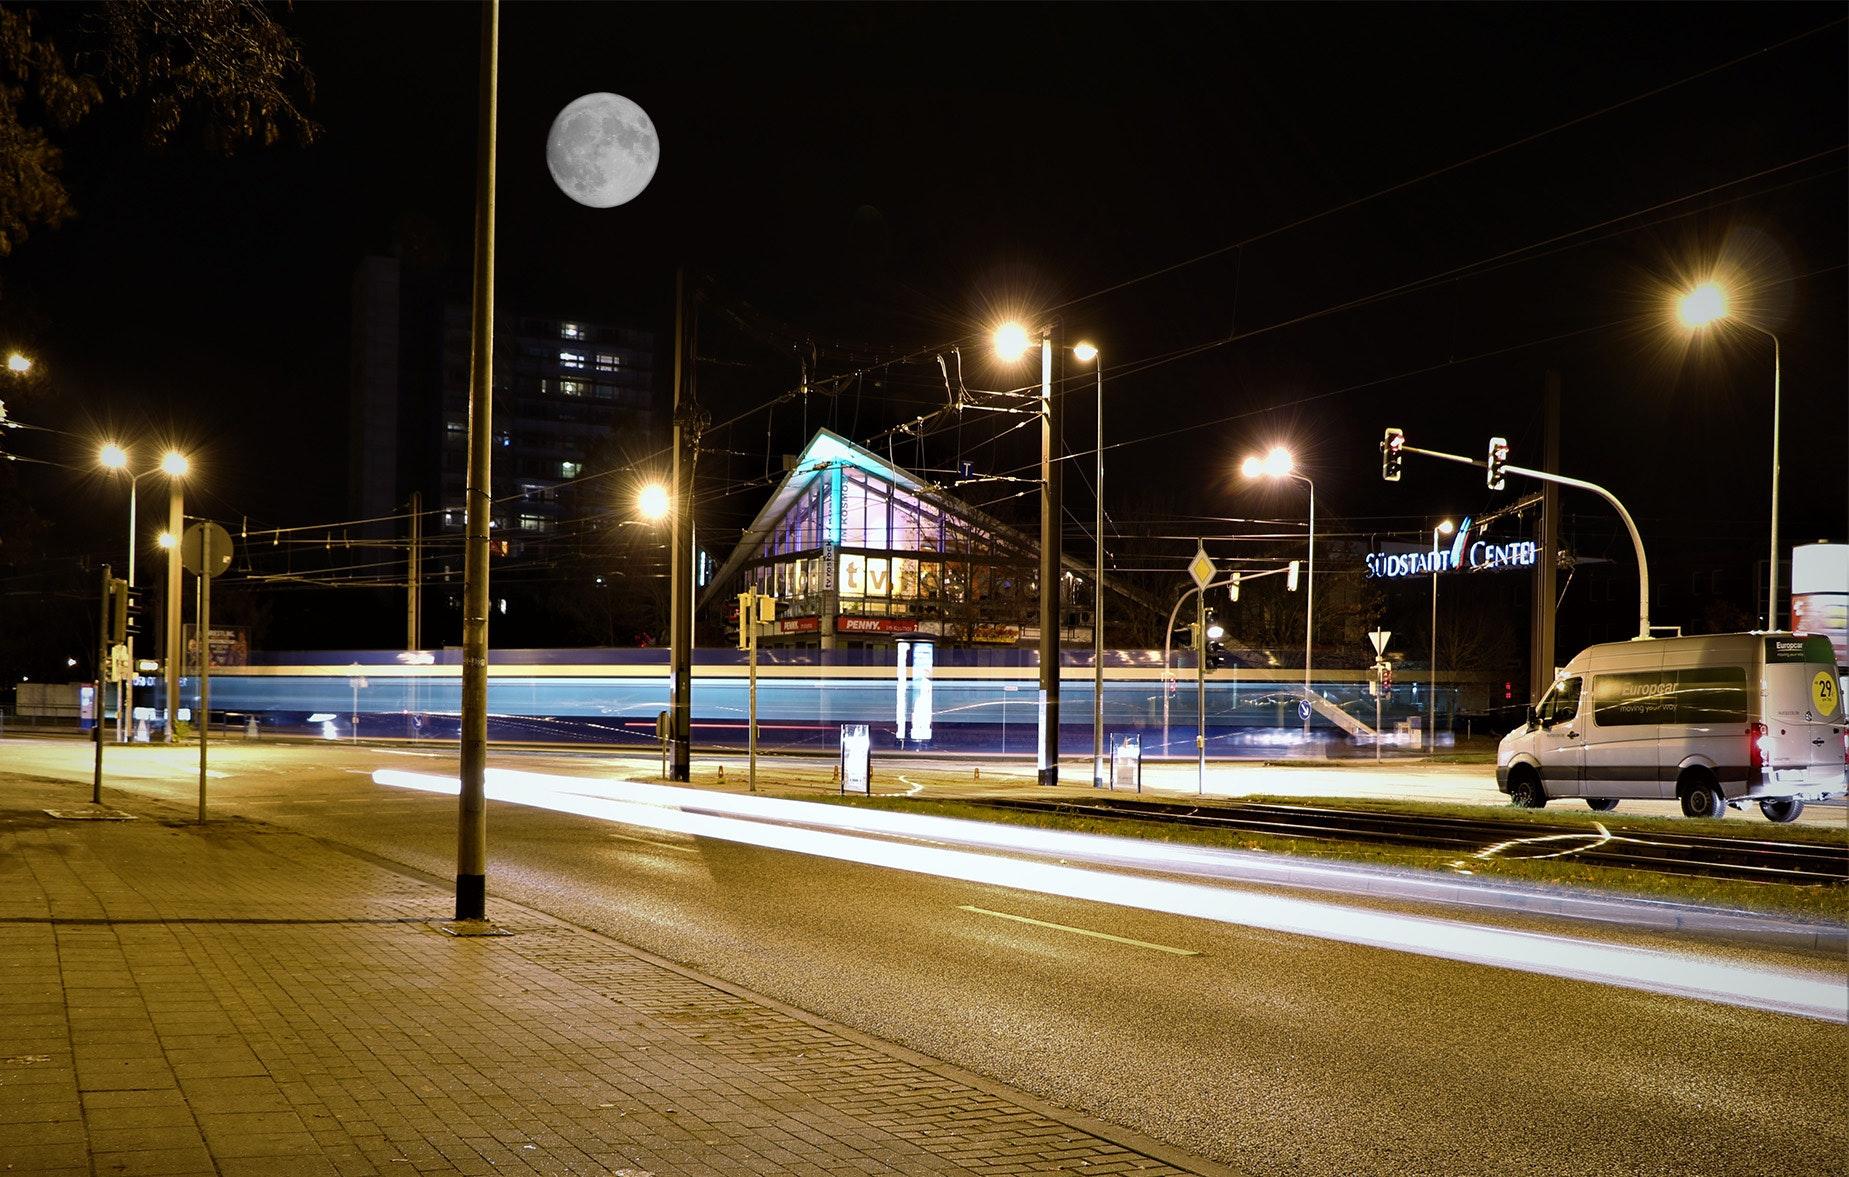 Illuminated Street Lights at Night, Architecture, Motion, Travel, Transportation system, HQ Photo